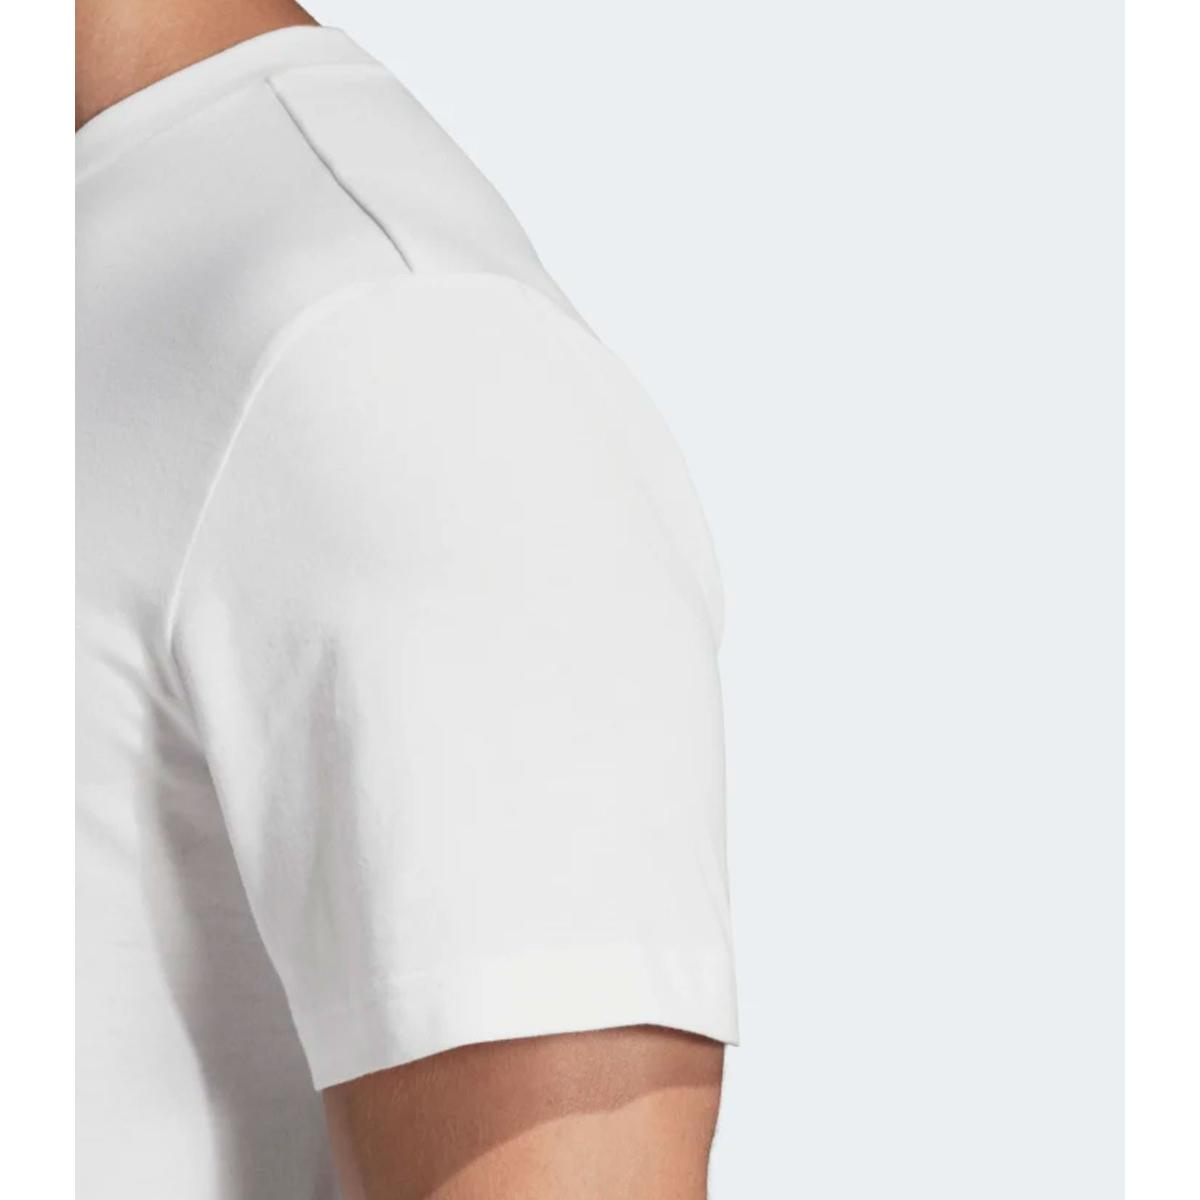 T-shirt Adidas girocollo con stampa Essentials 3-Stripes da uomo rif. DT9929